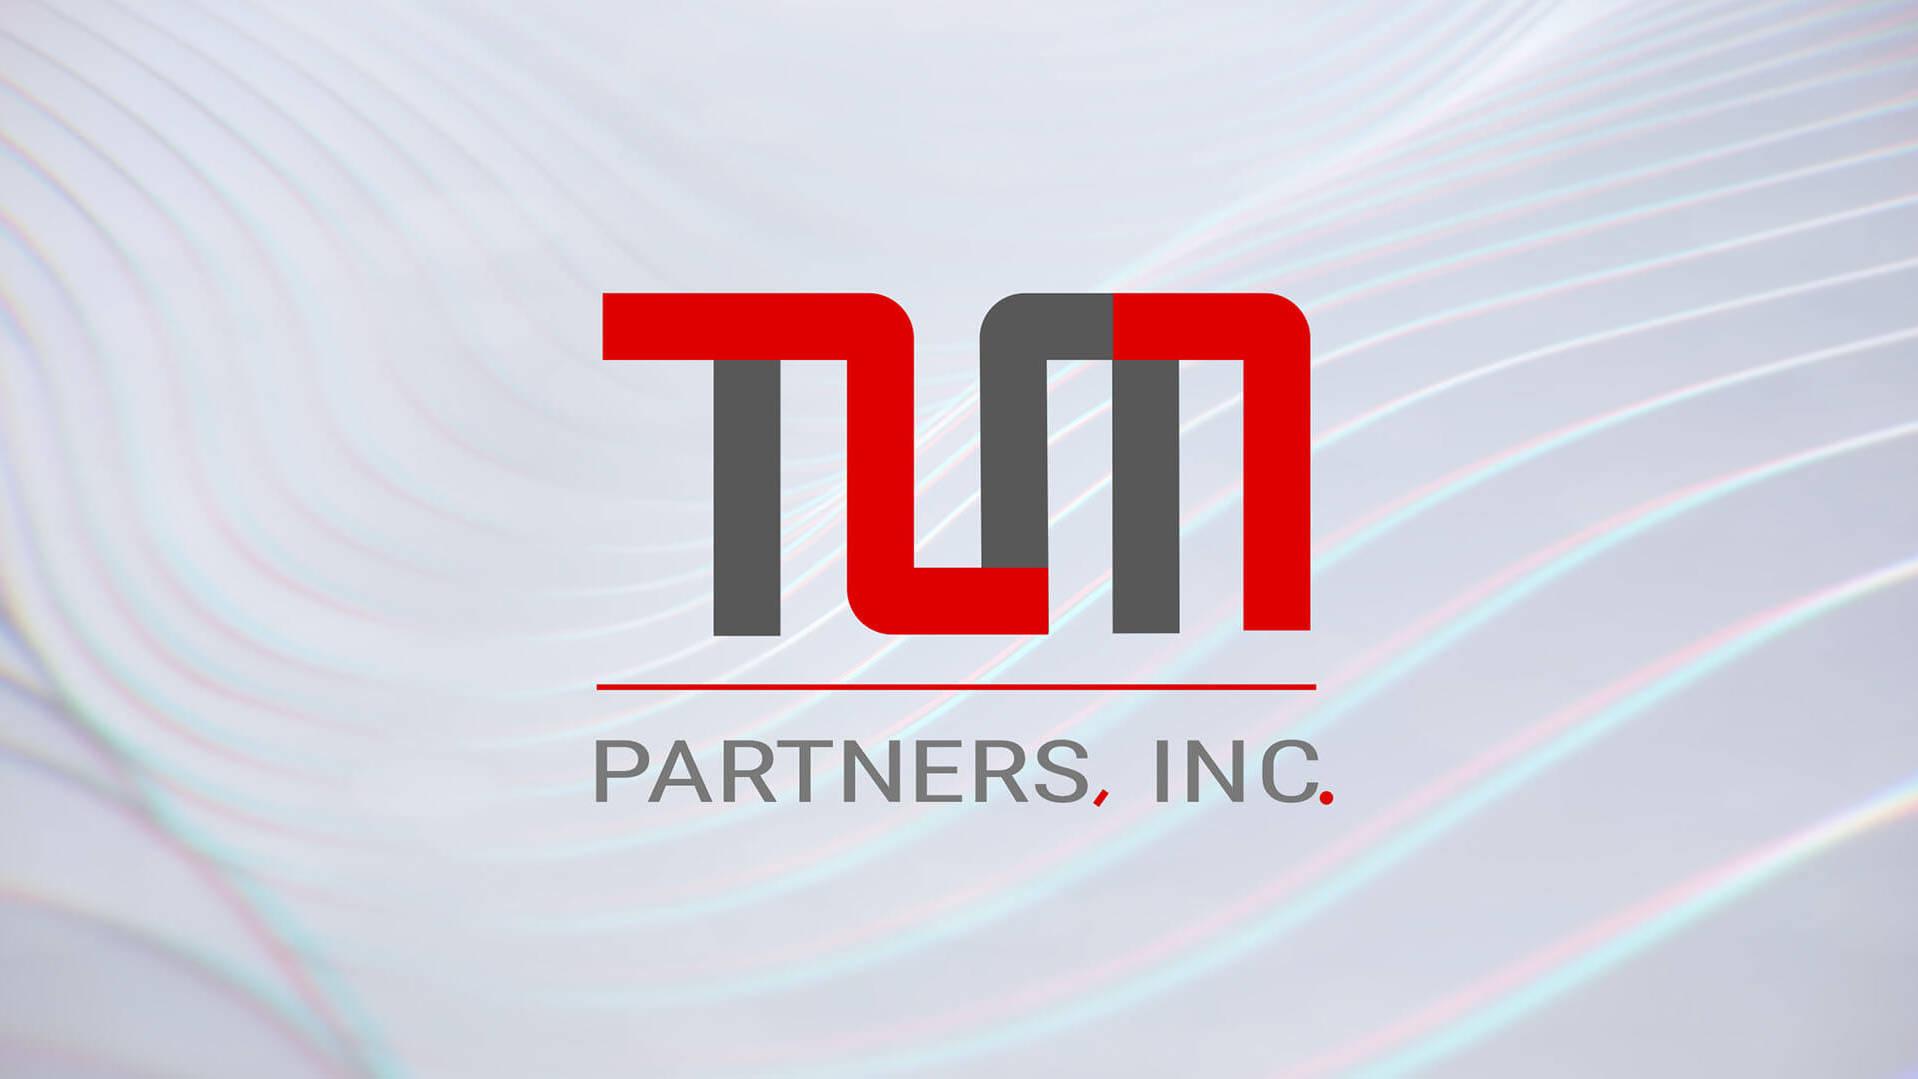 TLM news